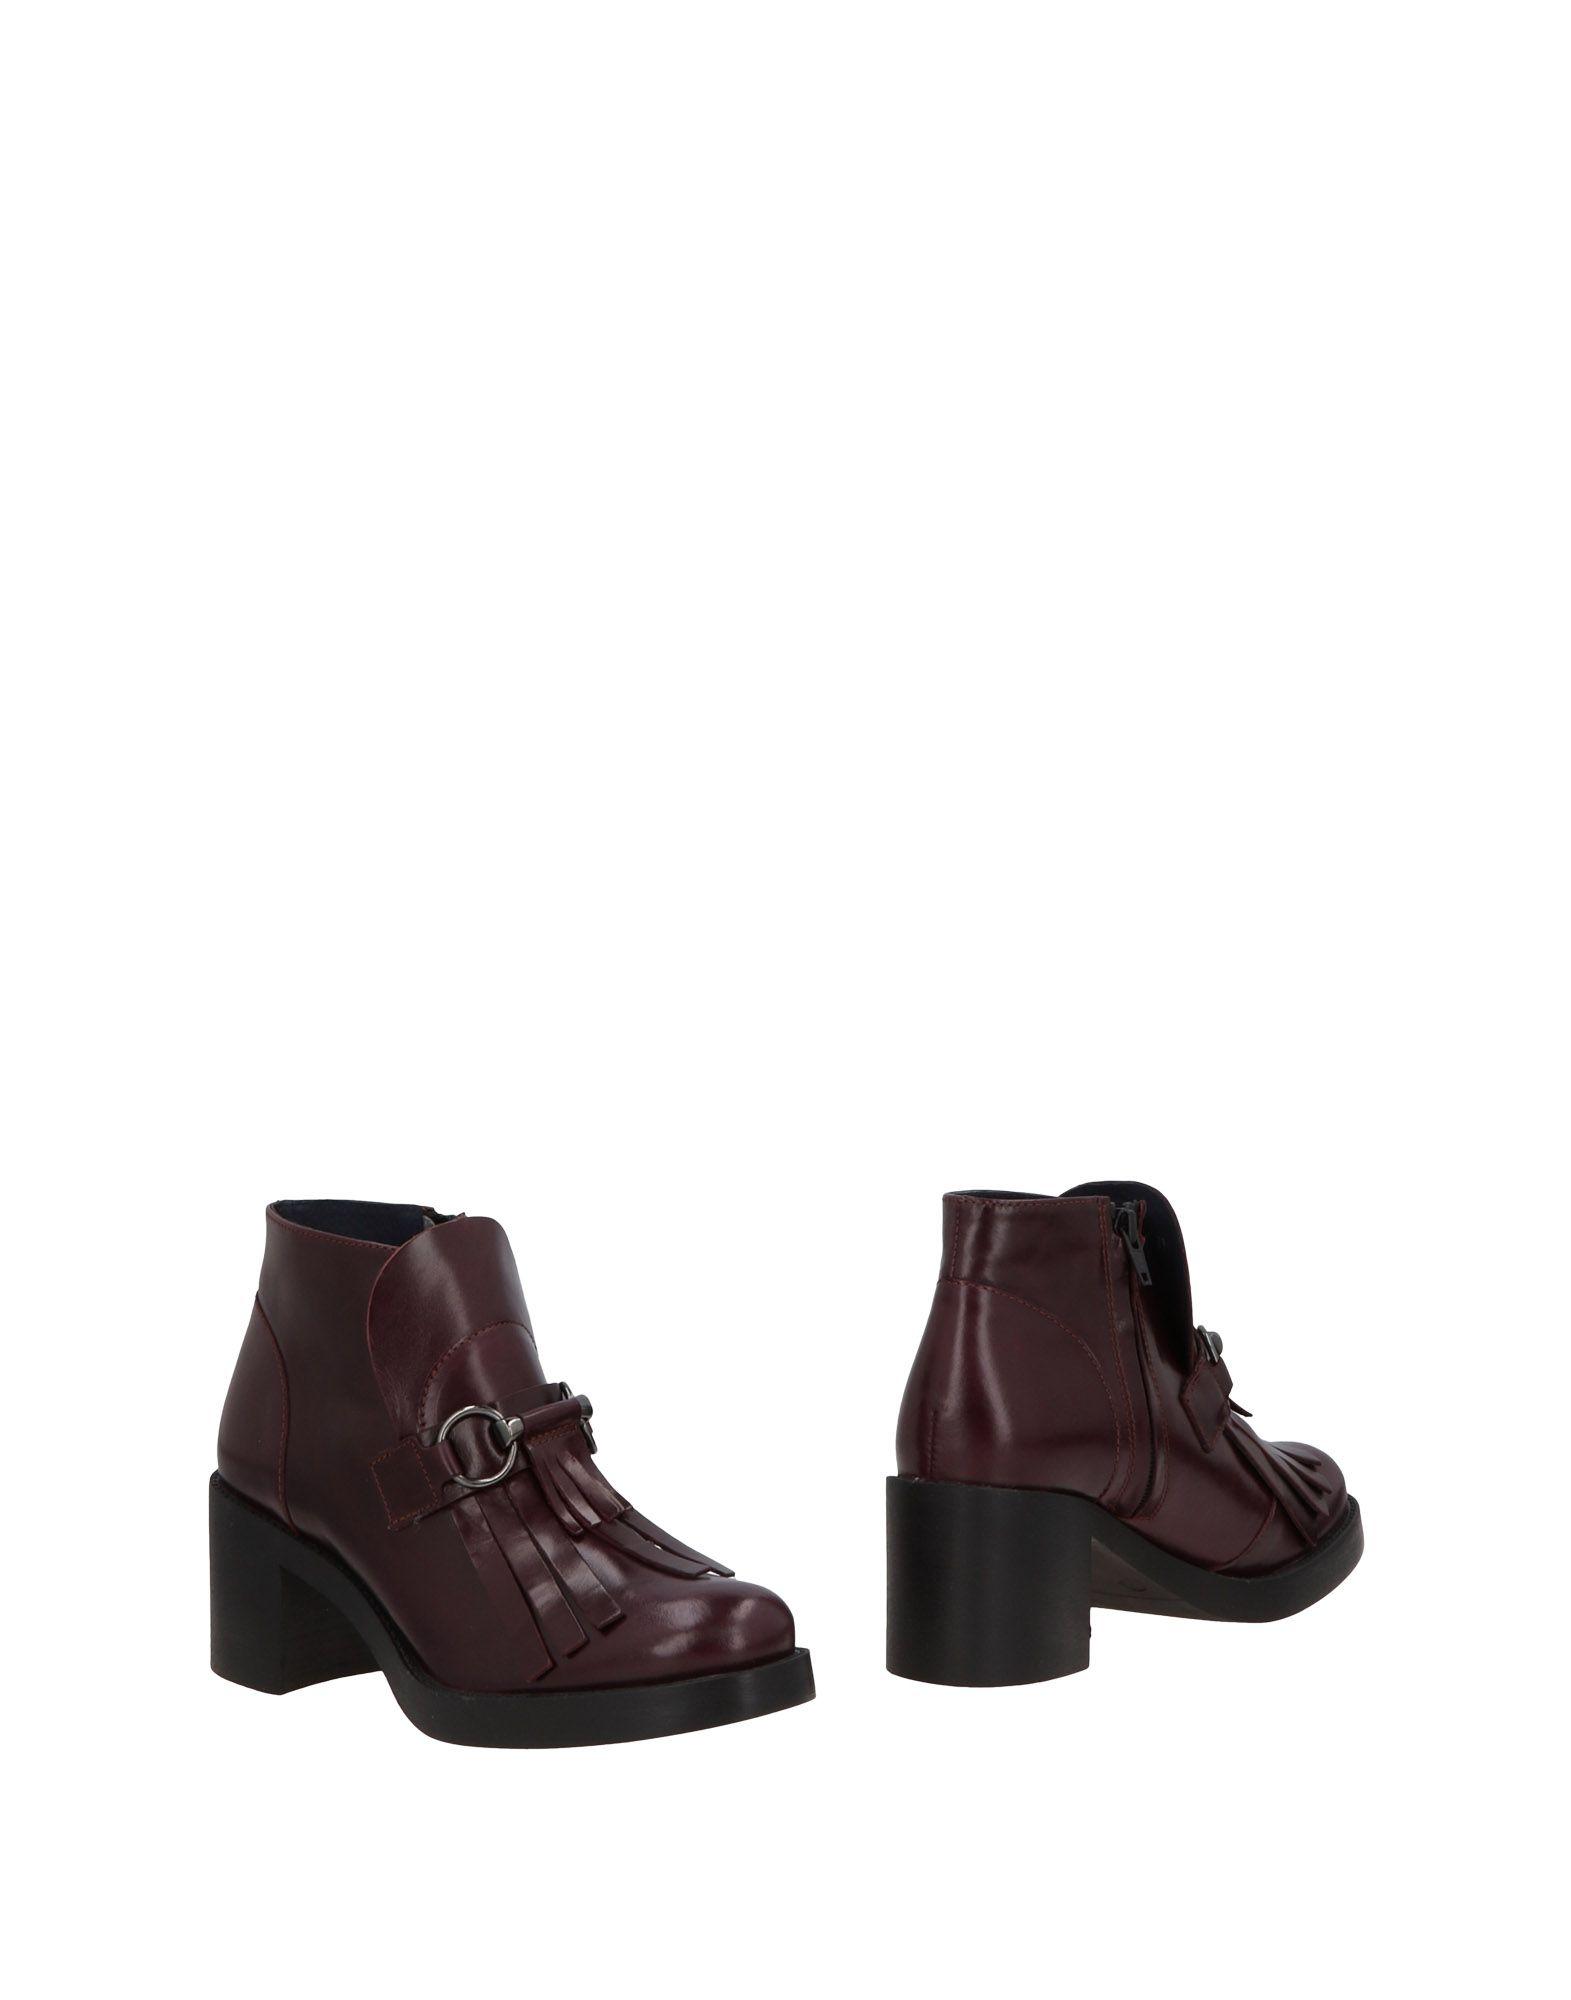 Docksteps Damen Stiefelette Damen Docksteps  11478969FP Gute Qualität beliebte Schuhe 982ee5